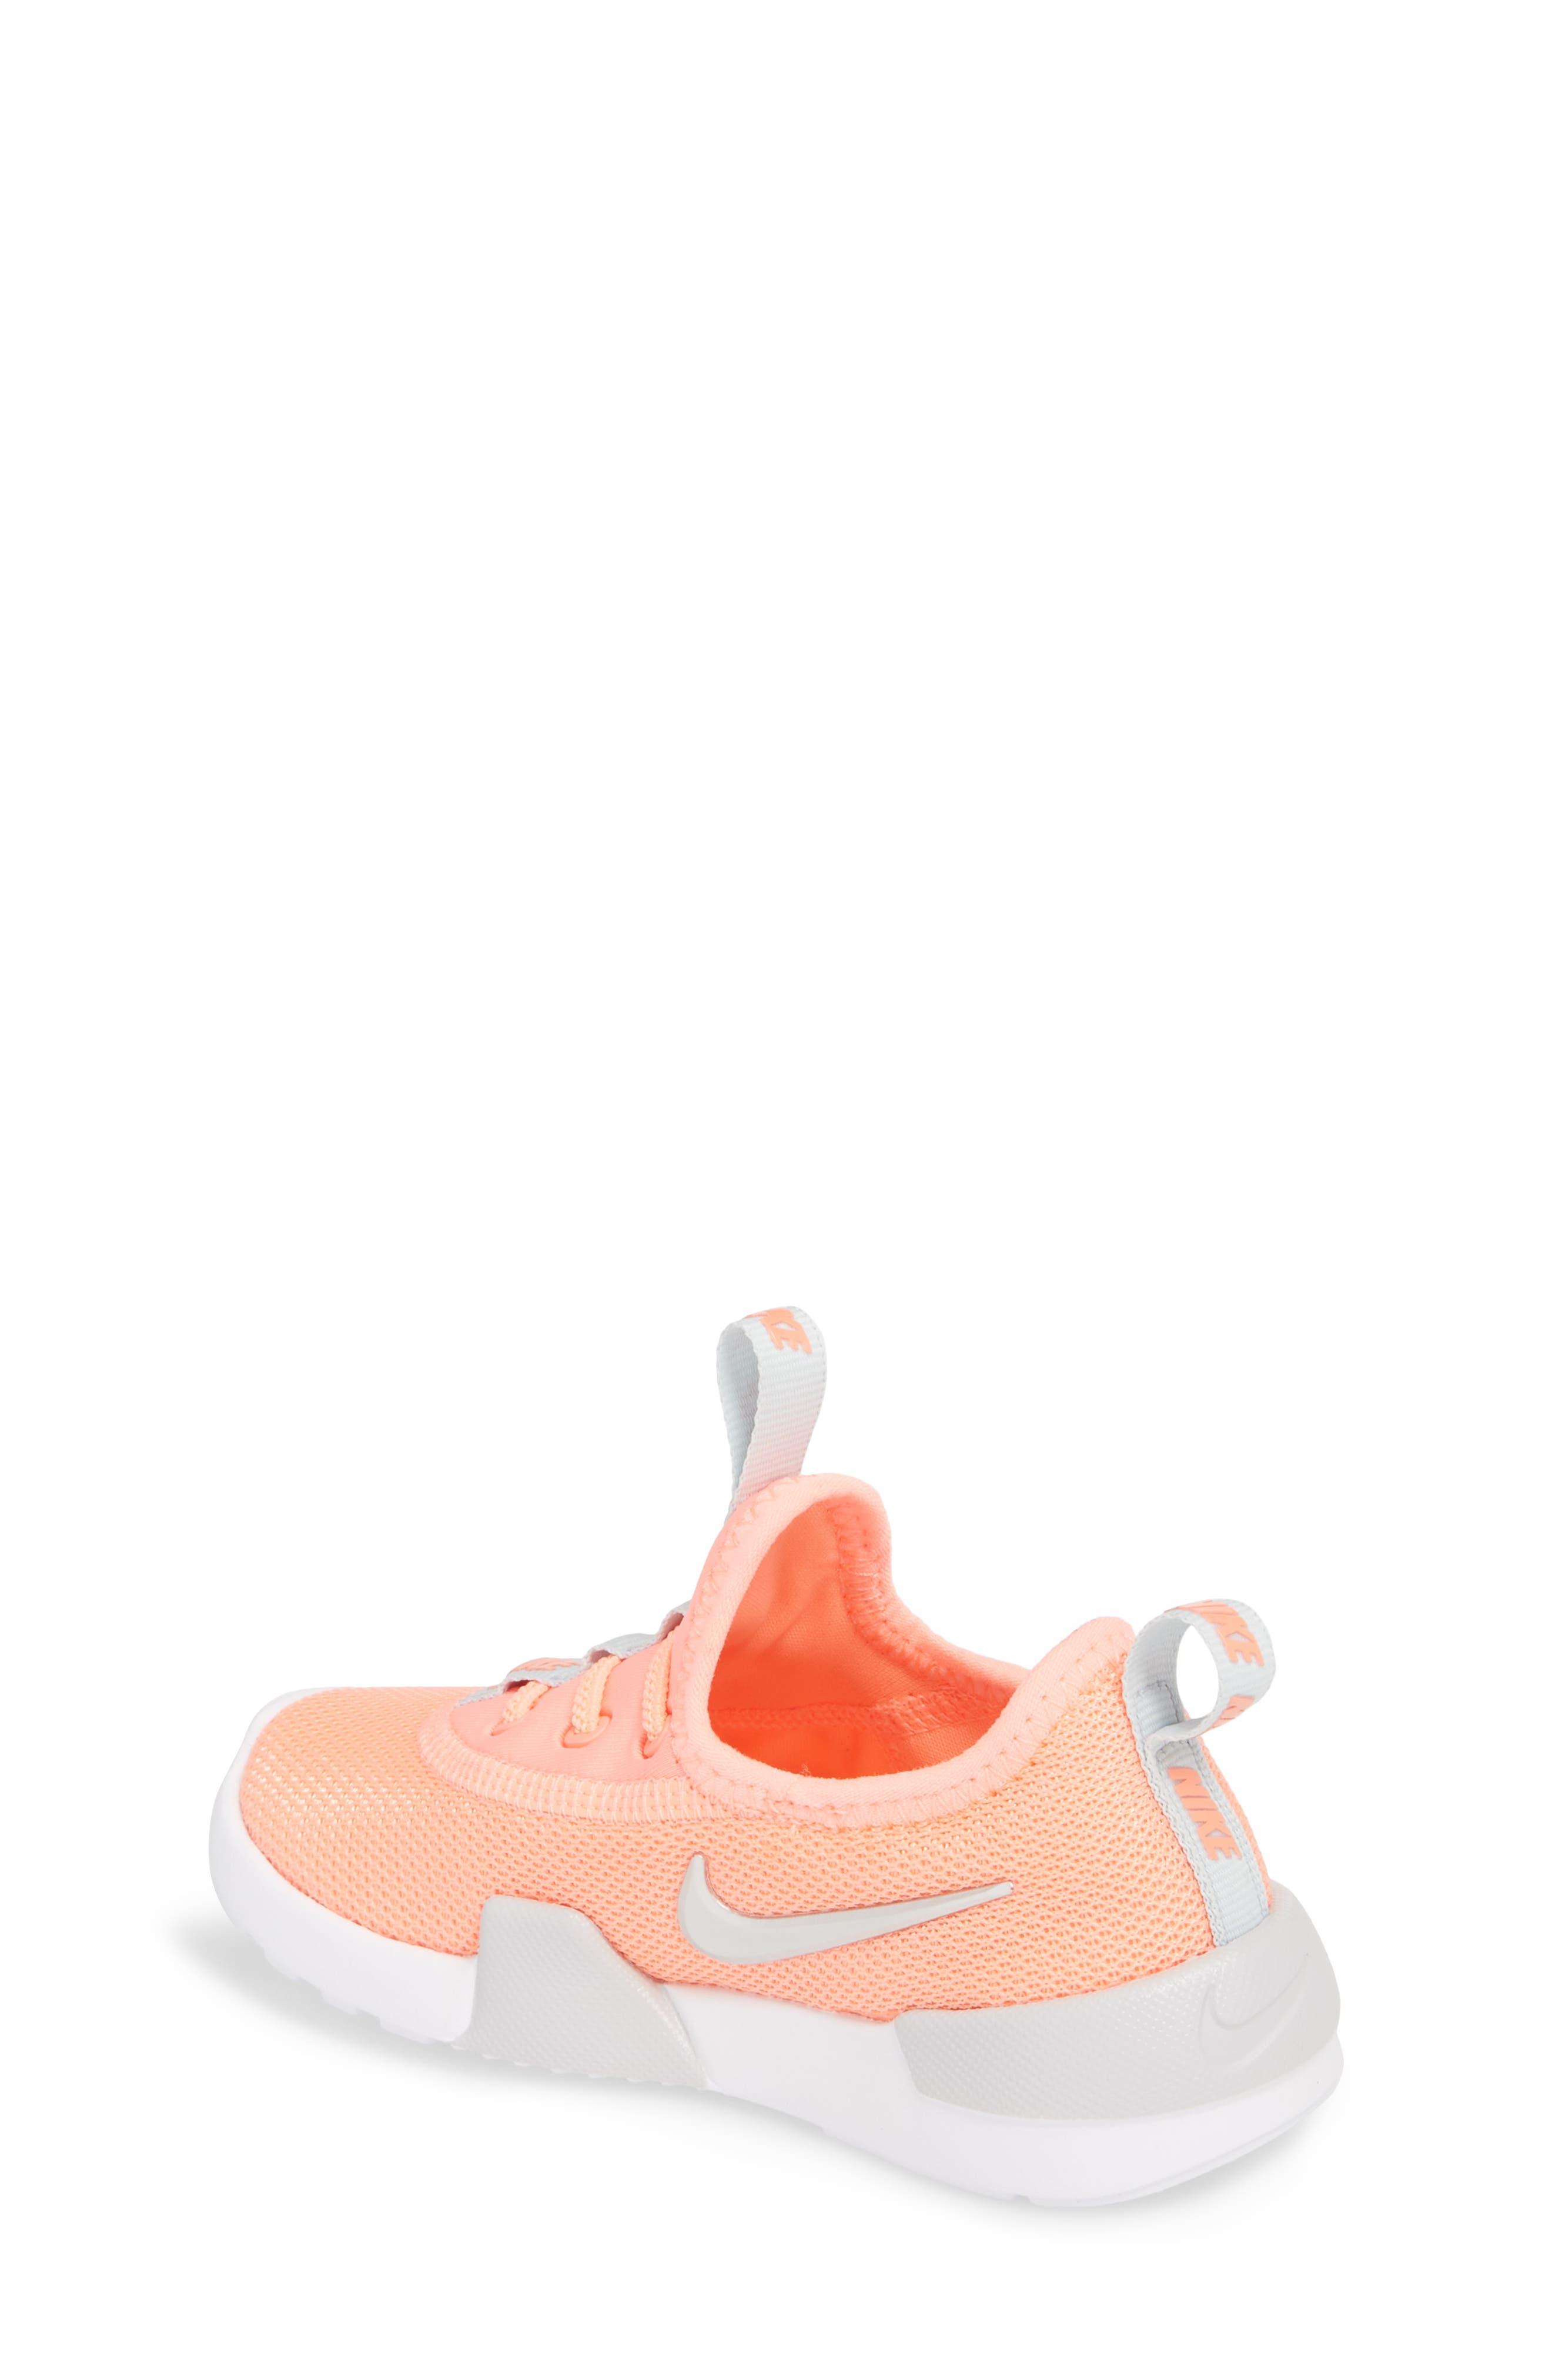 Ashin Modern Sock Knit Sneaker,                             Alternate thumbnail 2, color,                             Atomic Pink/ Metallic Silver